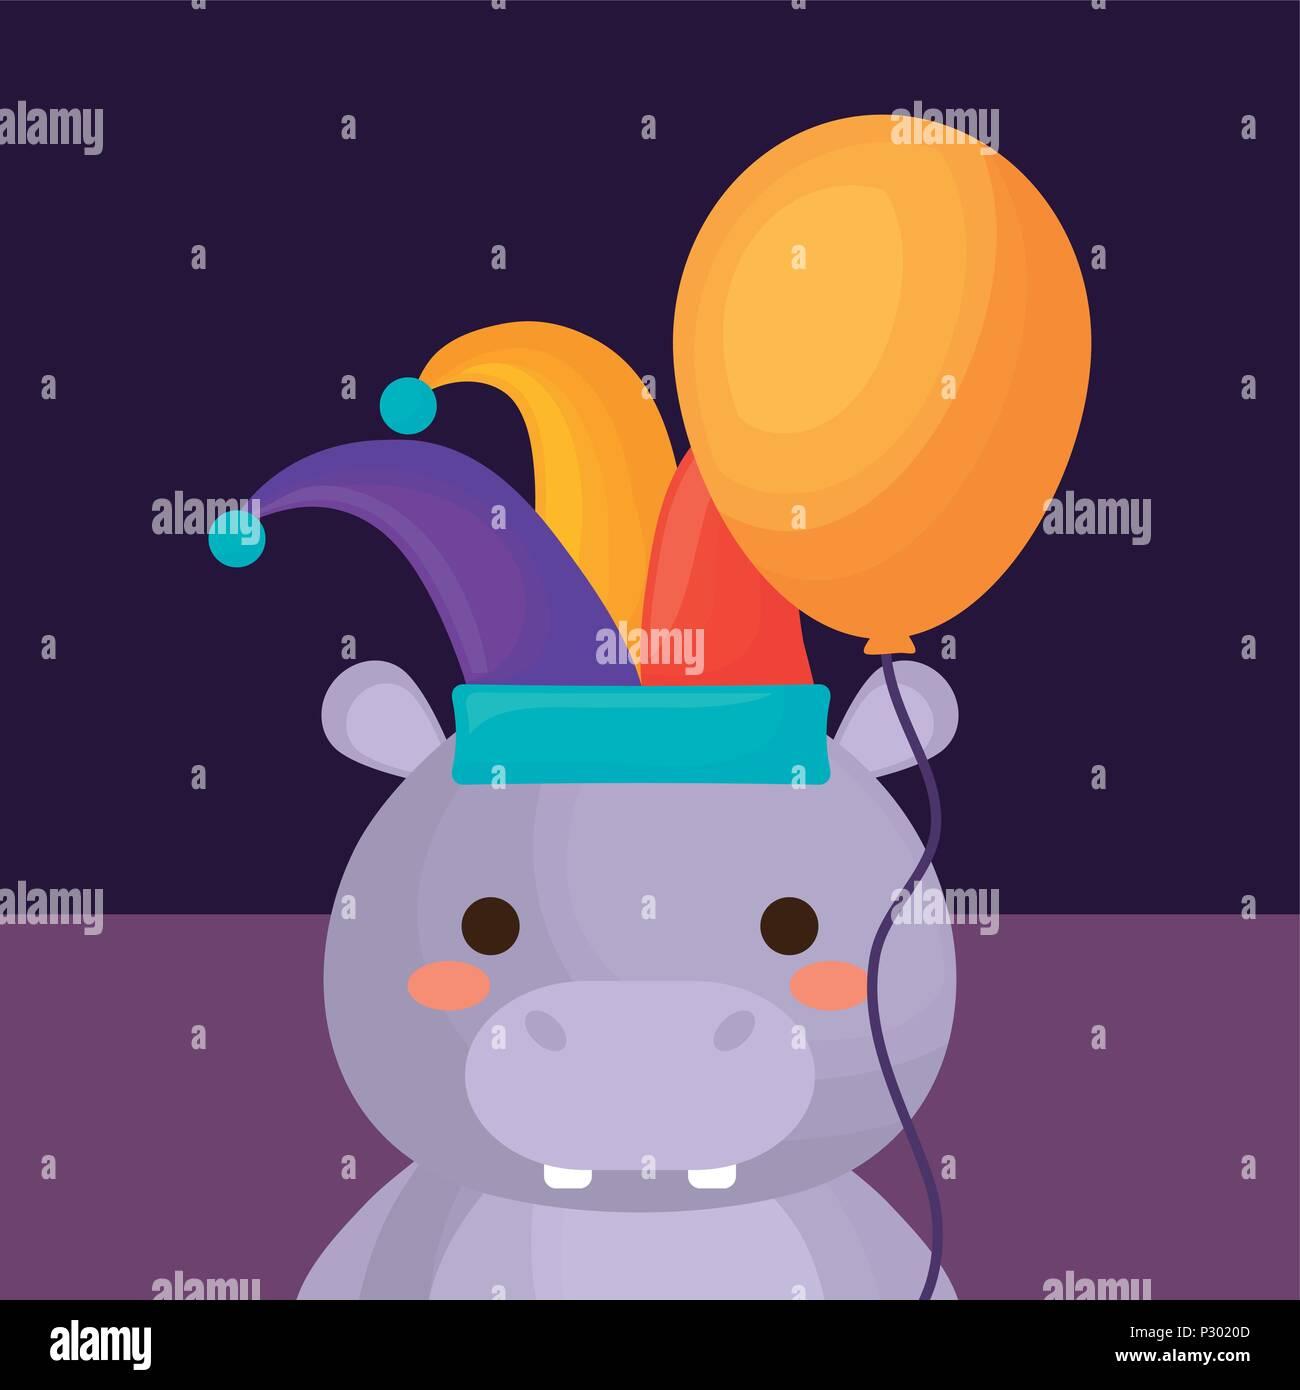 Diseño de circo de carnaval con hipopótamo con jester sombrero sobre fondo  púrpura bfb5f8d73d4